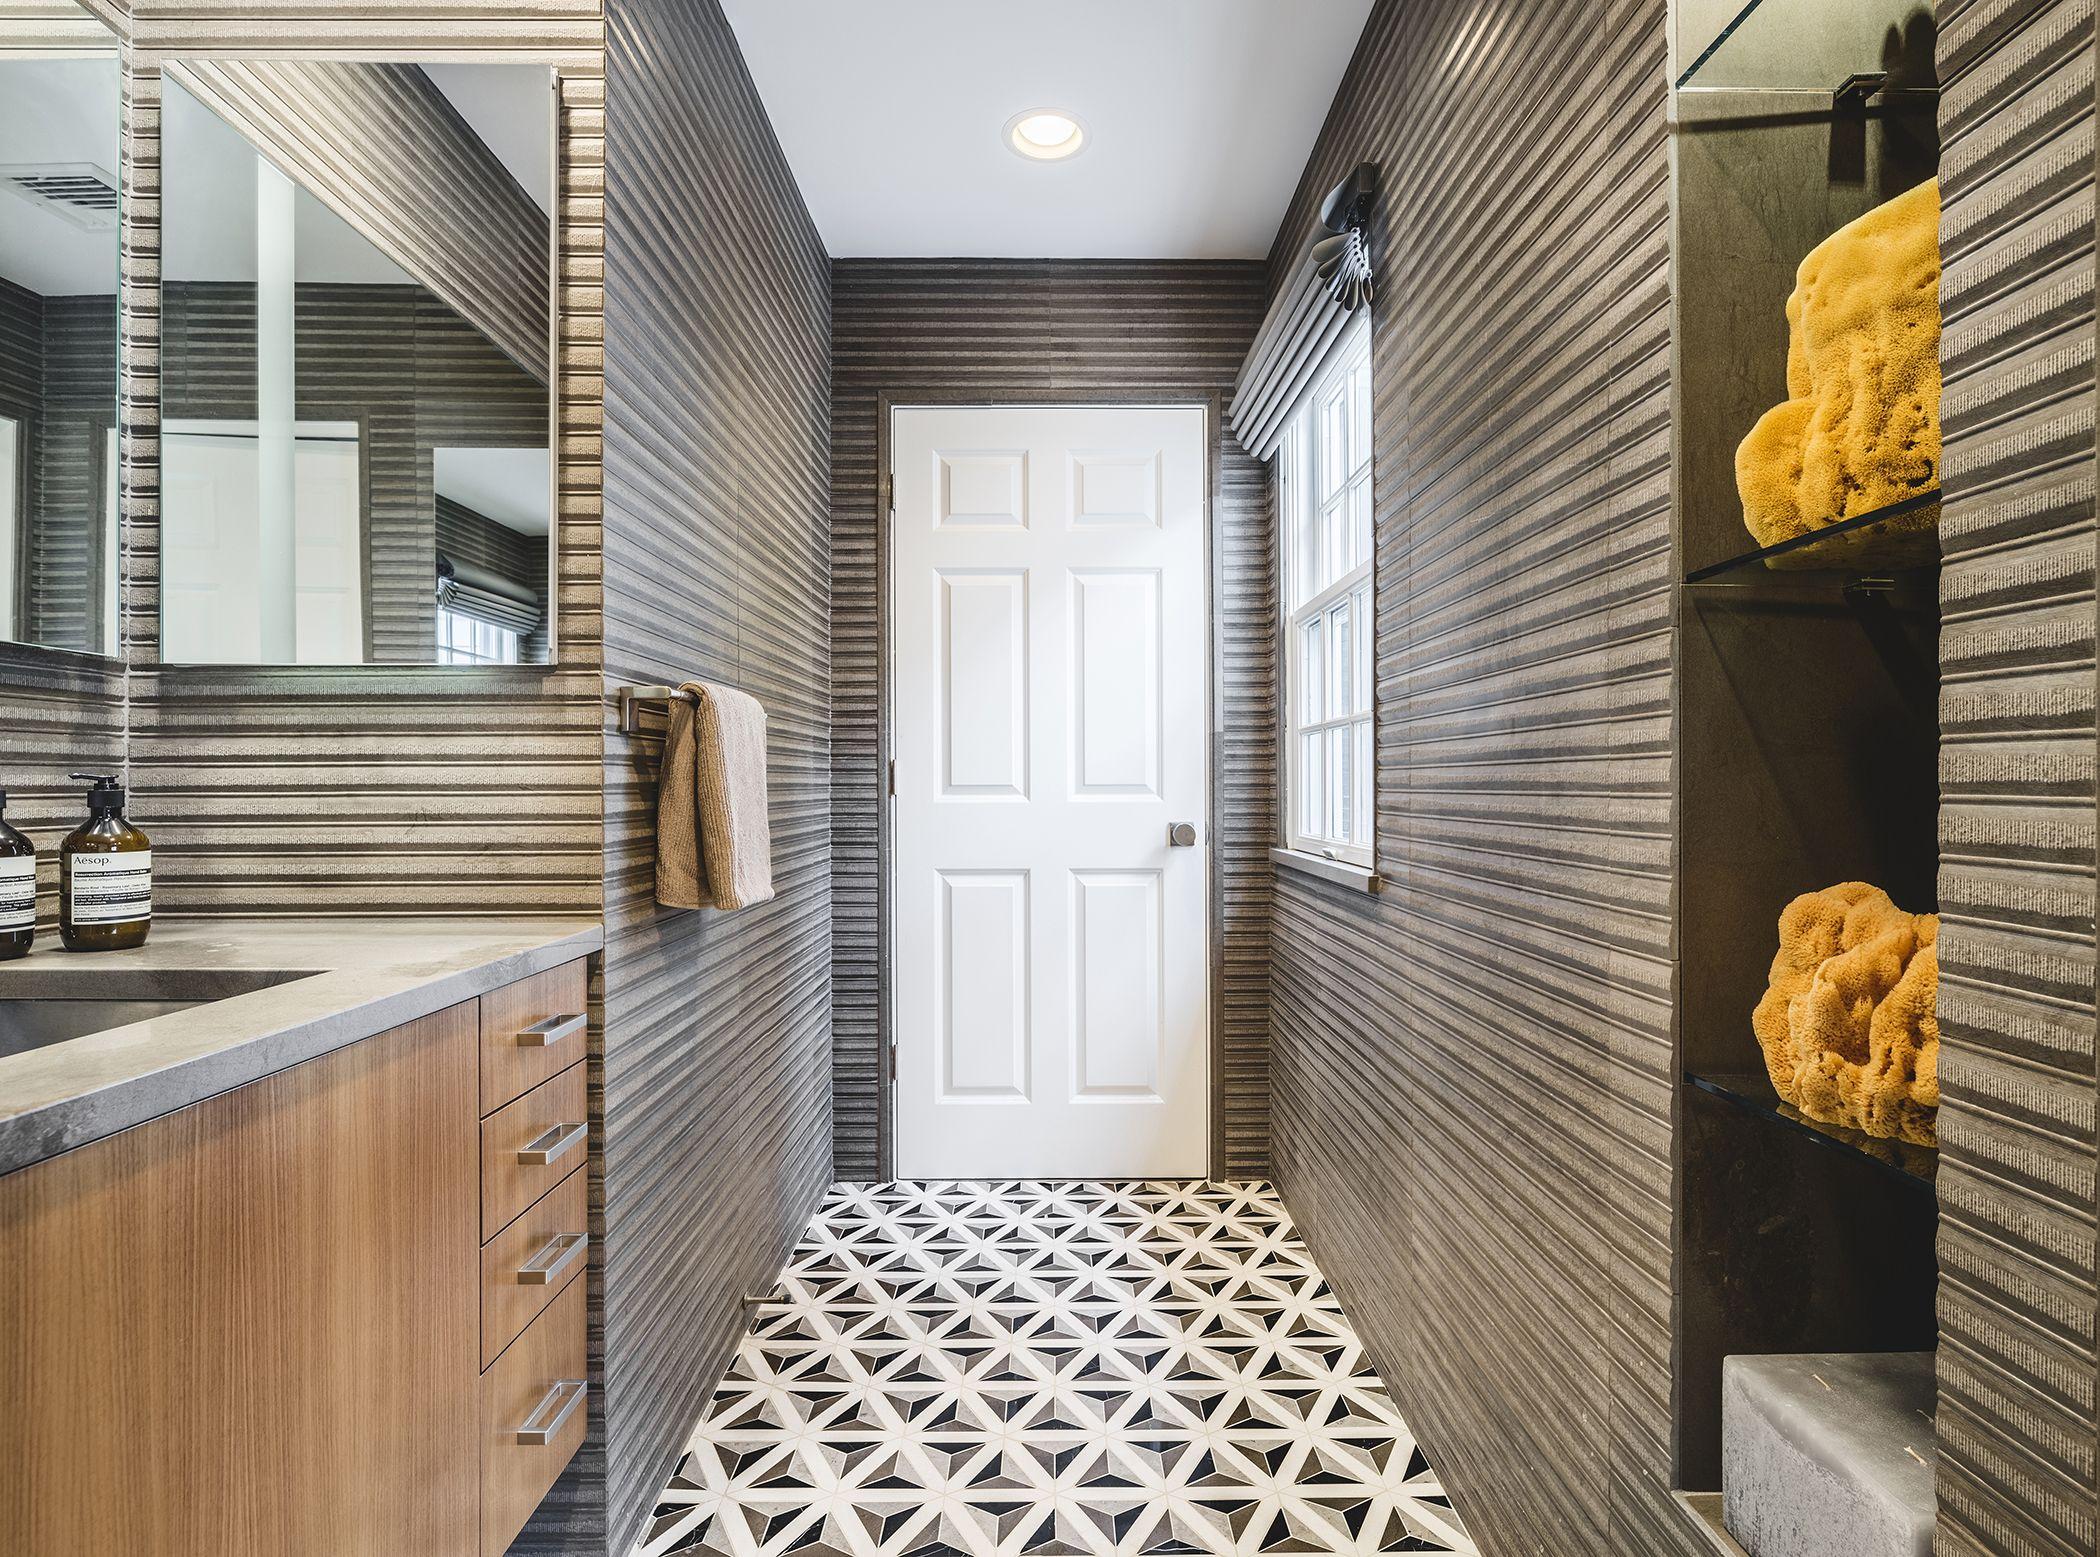 Artistic Tile Duomo Black Floor And Pannelli Grey Foussana Walls Artistic Tile Tile Design Custom Tile Design